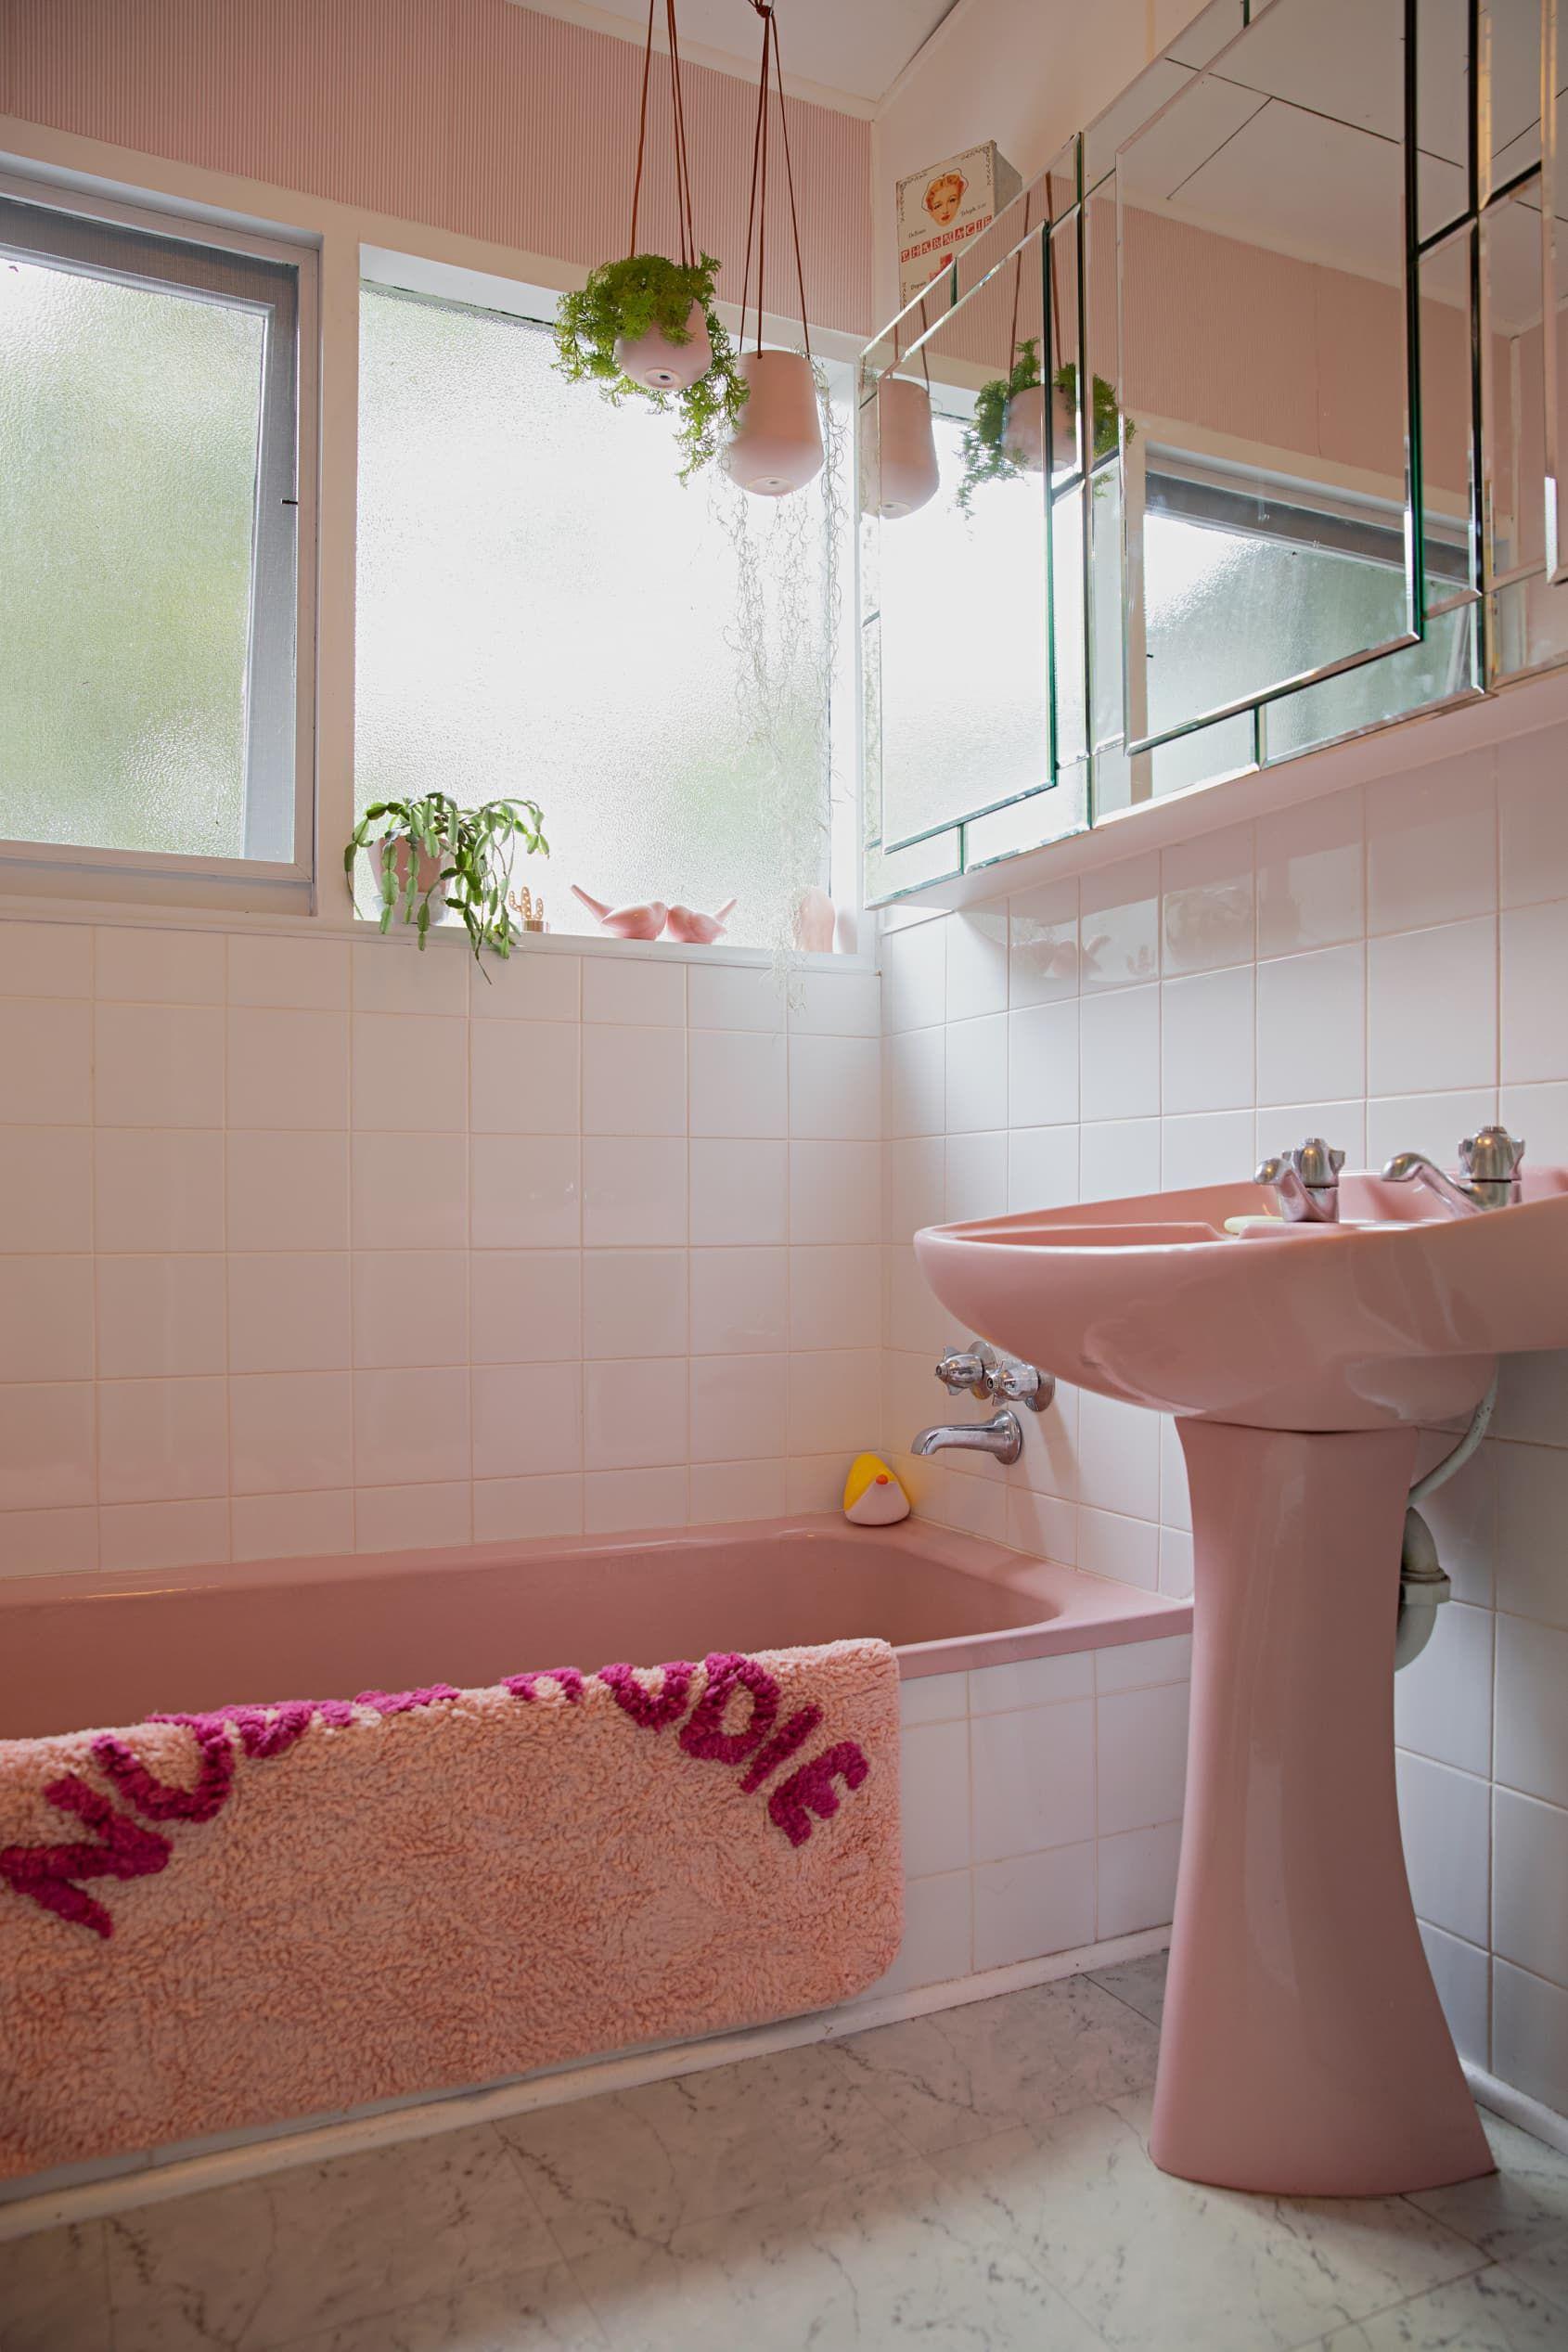 This Australian Retro Beachside Home Is Cute And Colorful Pink Bathroom Vintage Retro Bathrooms Retro Home Decor [ 2535 x 1690 Pixel ]